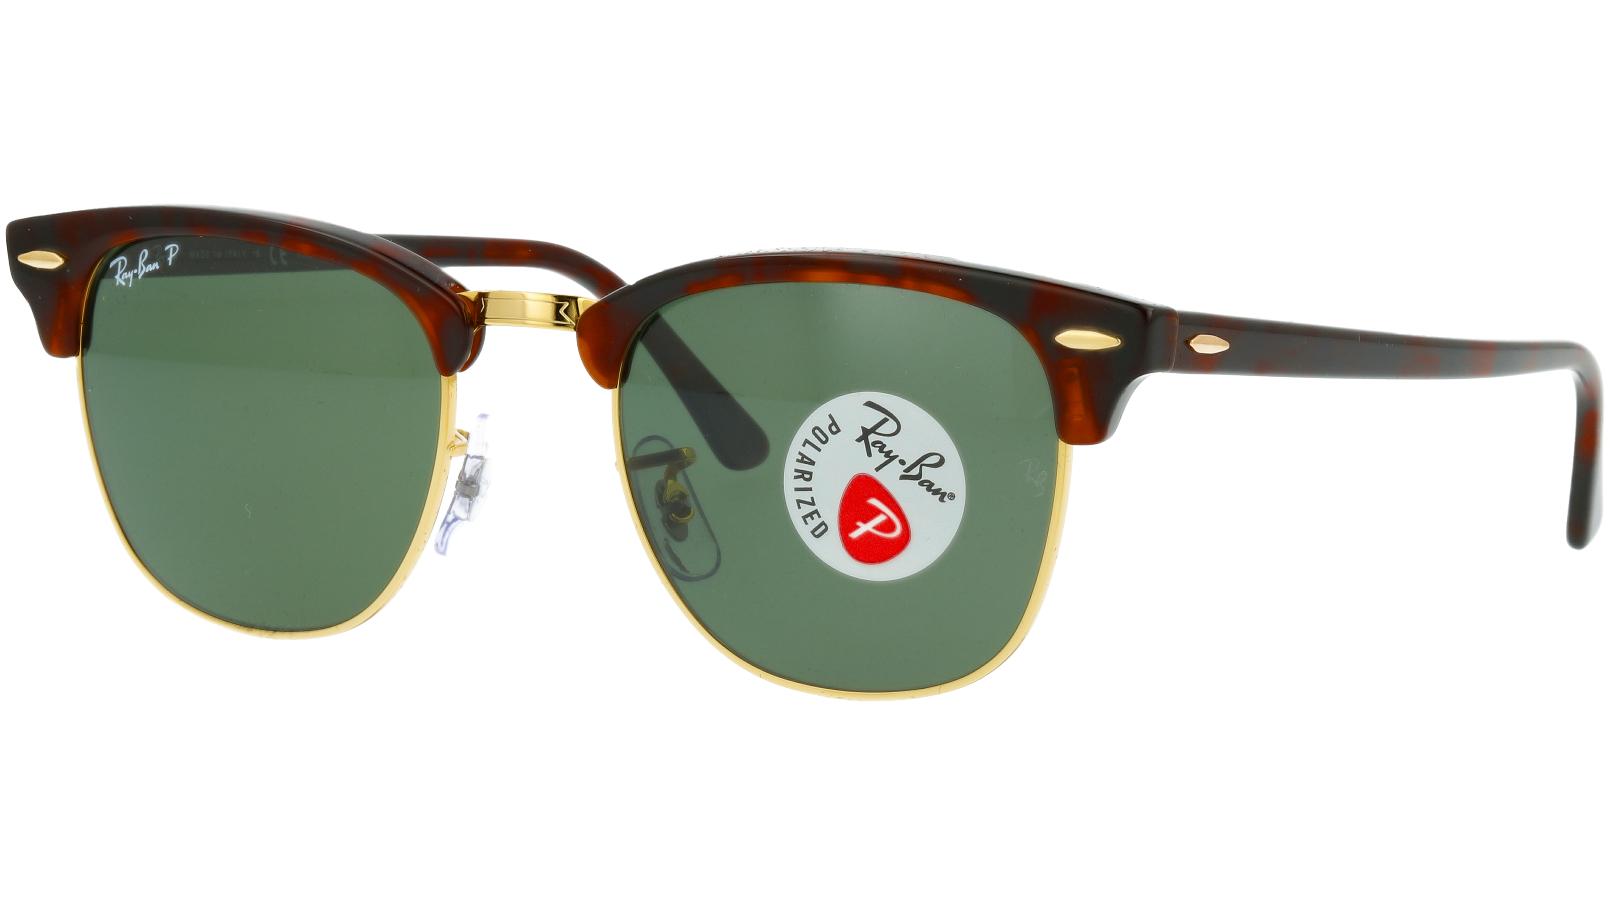 Ray-Ban RB3016 W0365 51 BLACK Sunglasses